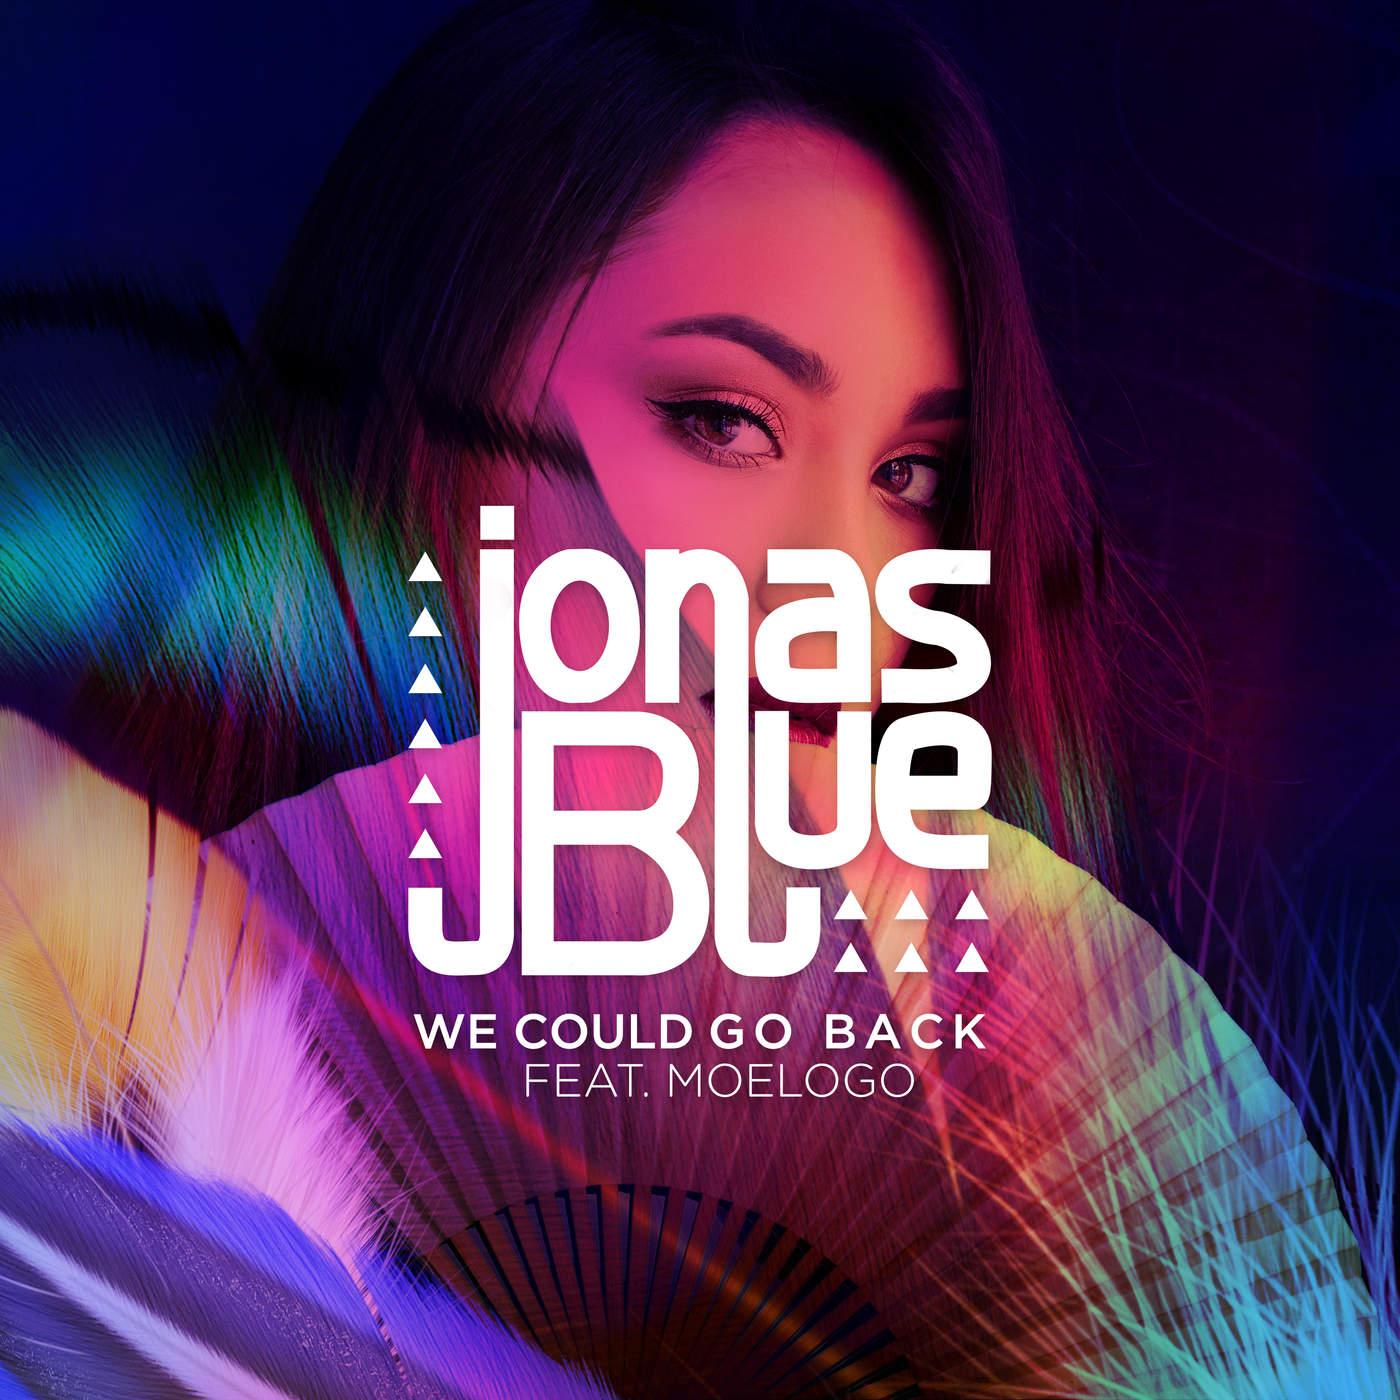 Girls Like You Mp3 Song Free Download: Jonas Blue Ft. MoeLogo